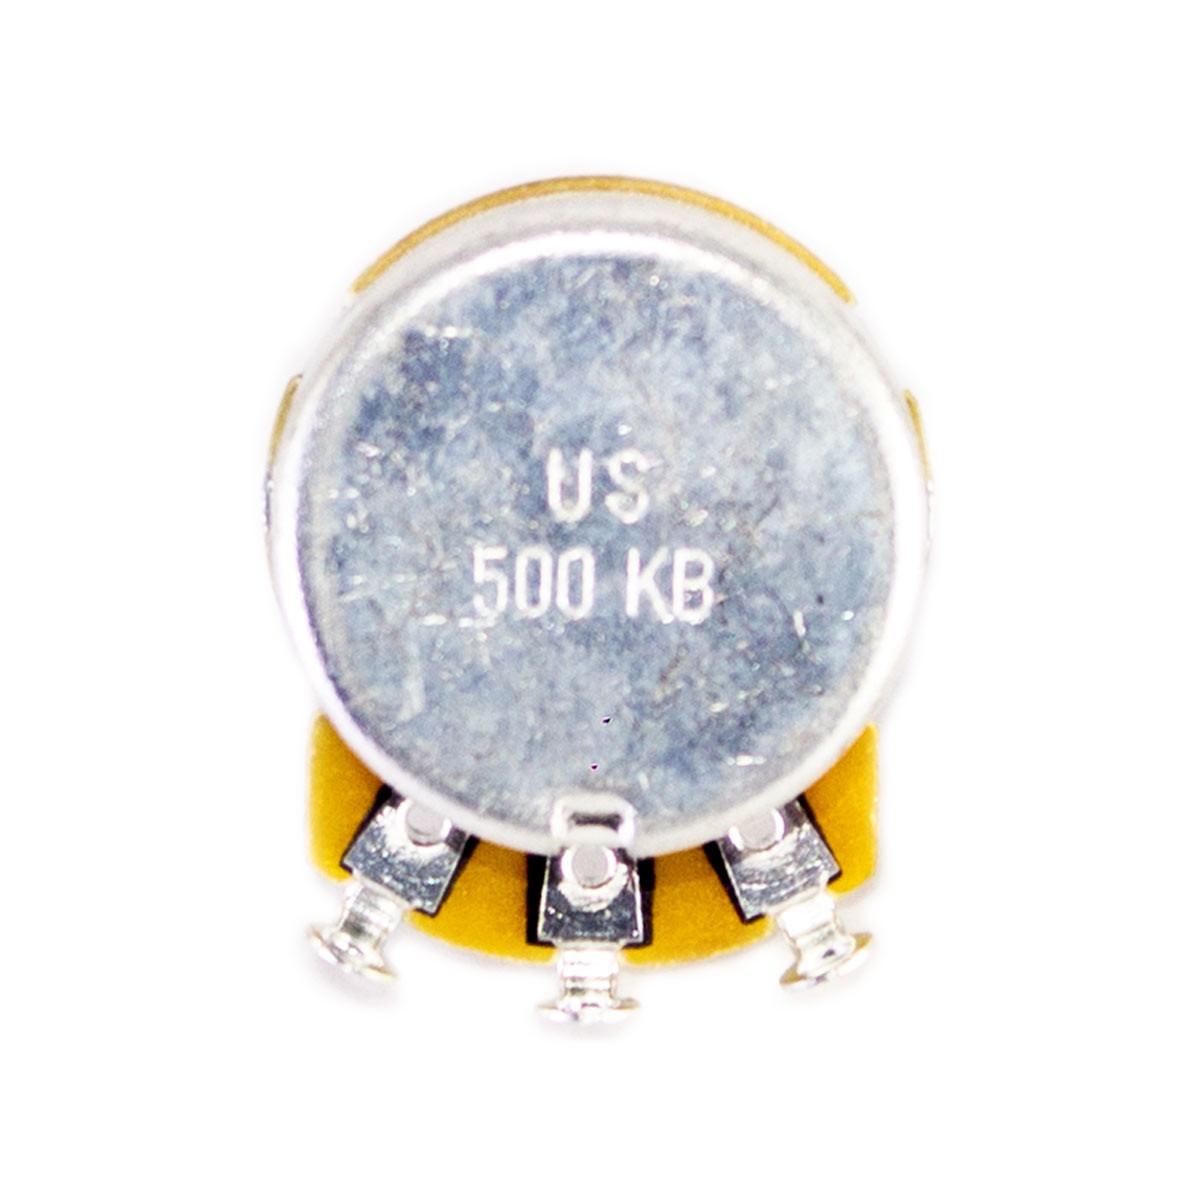 Potenciômetro Spirit B500 Base Grande Eixo Longo